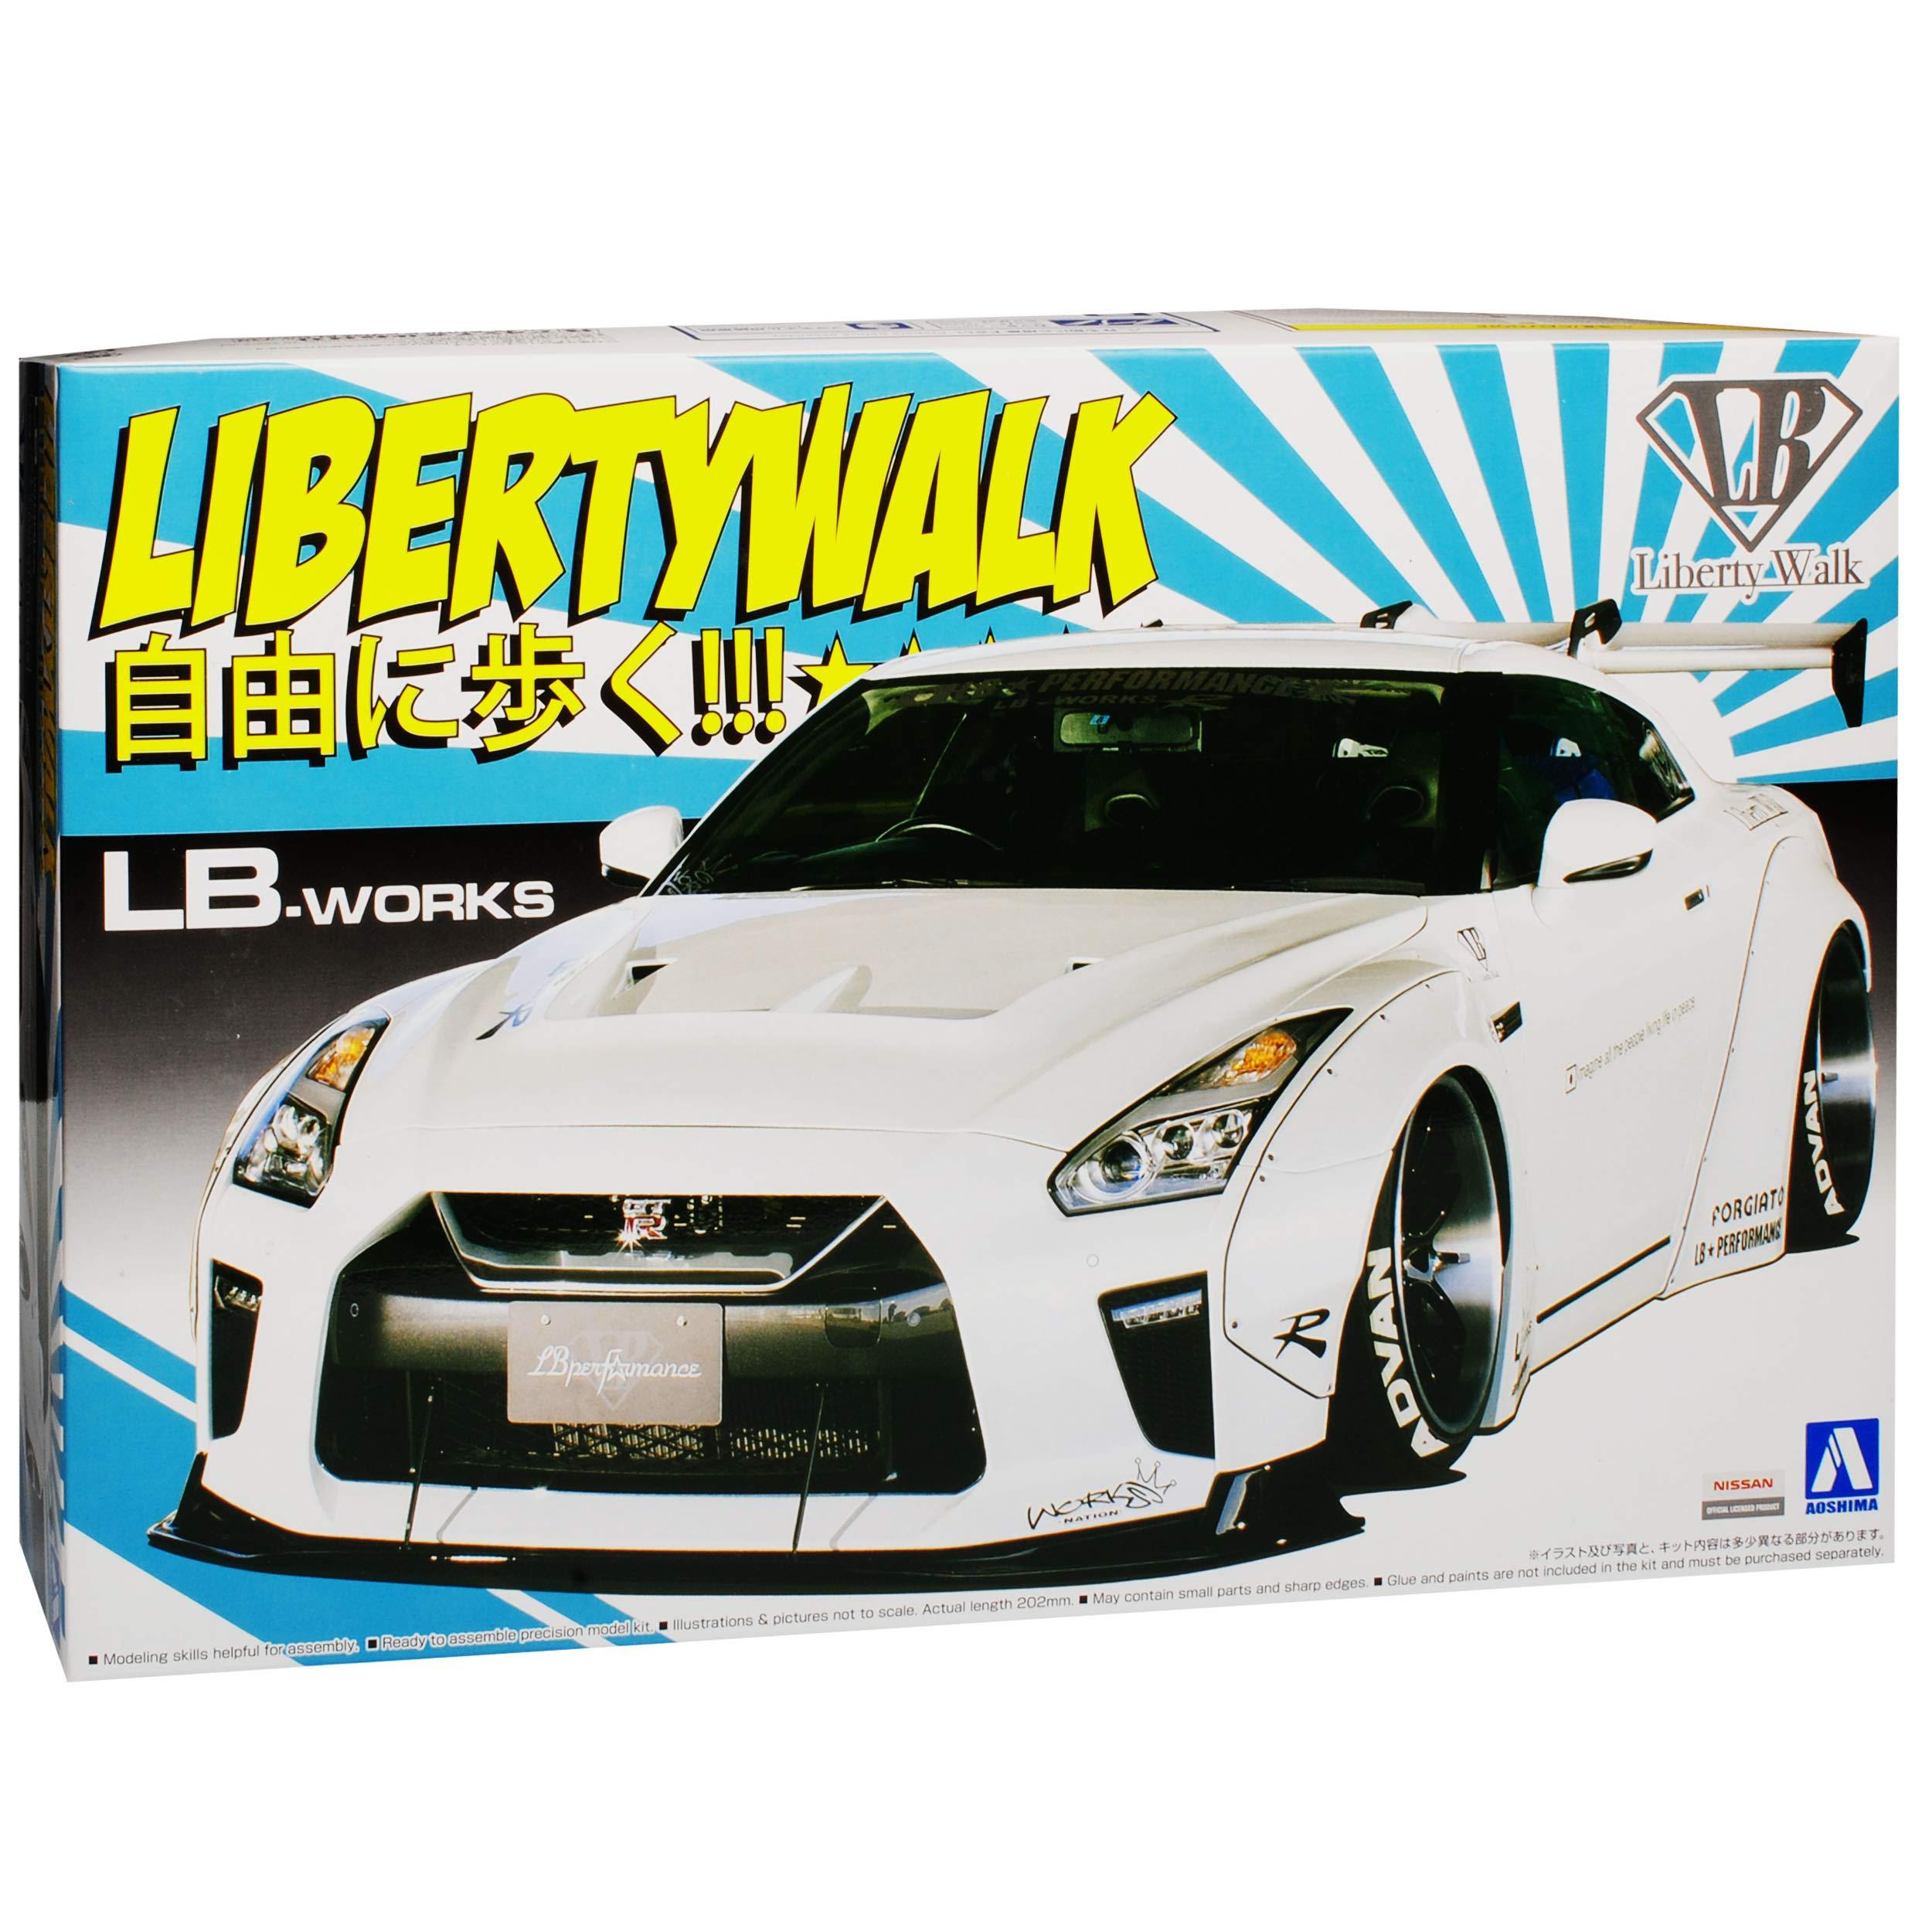 Nissan Skyline R35 GT-R LB-Works Liberty Walk Weiss 55908 Nr 11 Kit Bausatz 1//24